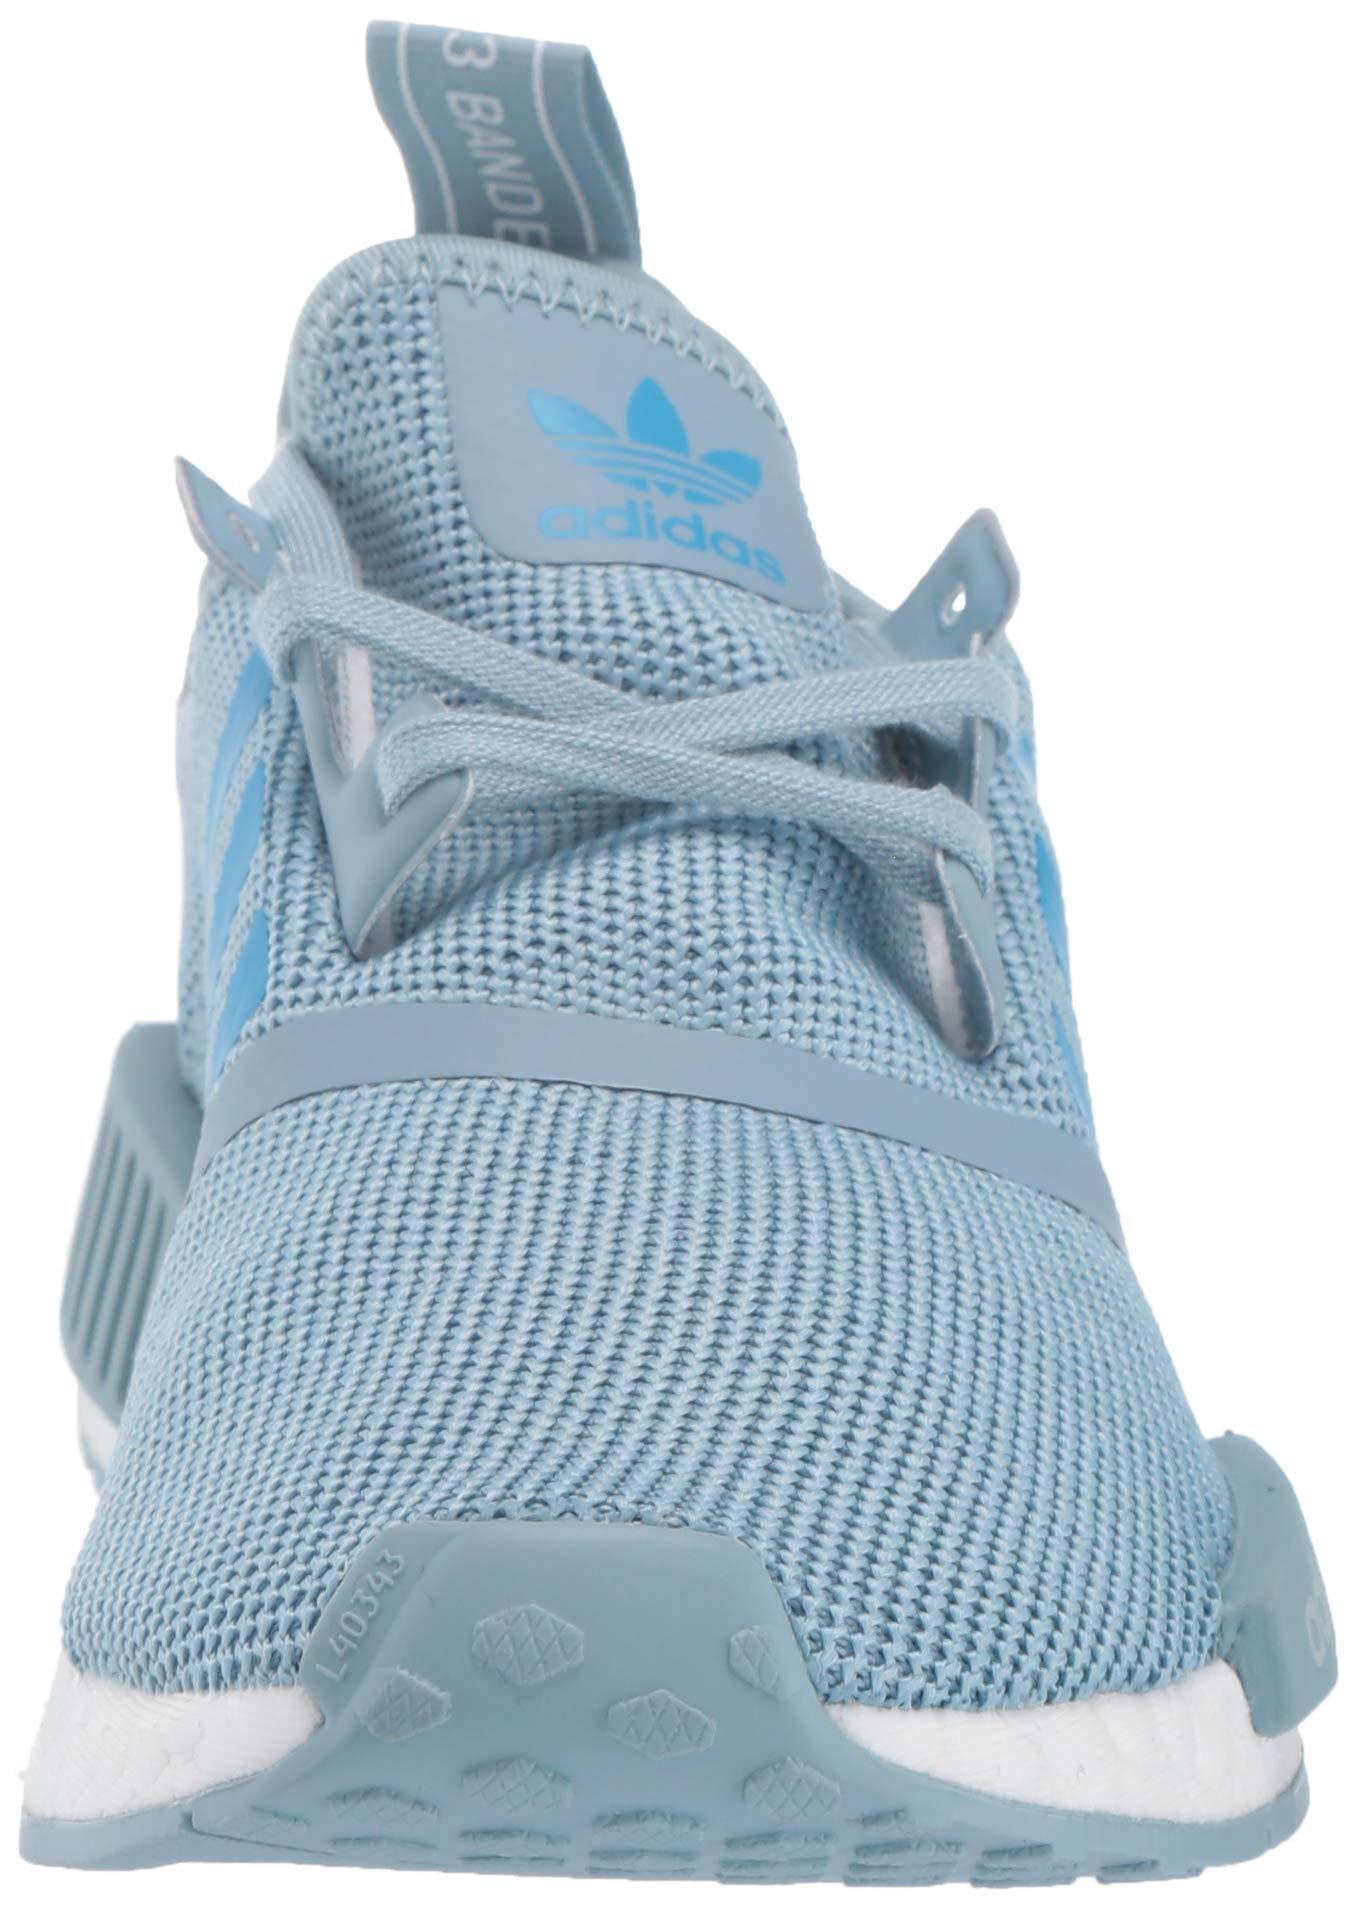 adidas Originals Unisex NMD_R1 Running Shoe ash Grey/Shock Cyan/White 4 M US Big Kid by adidas Originals (Image #4)